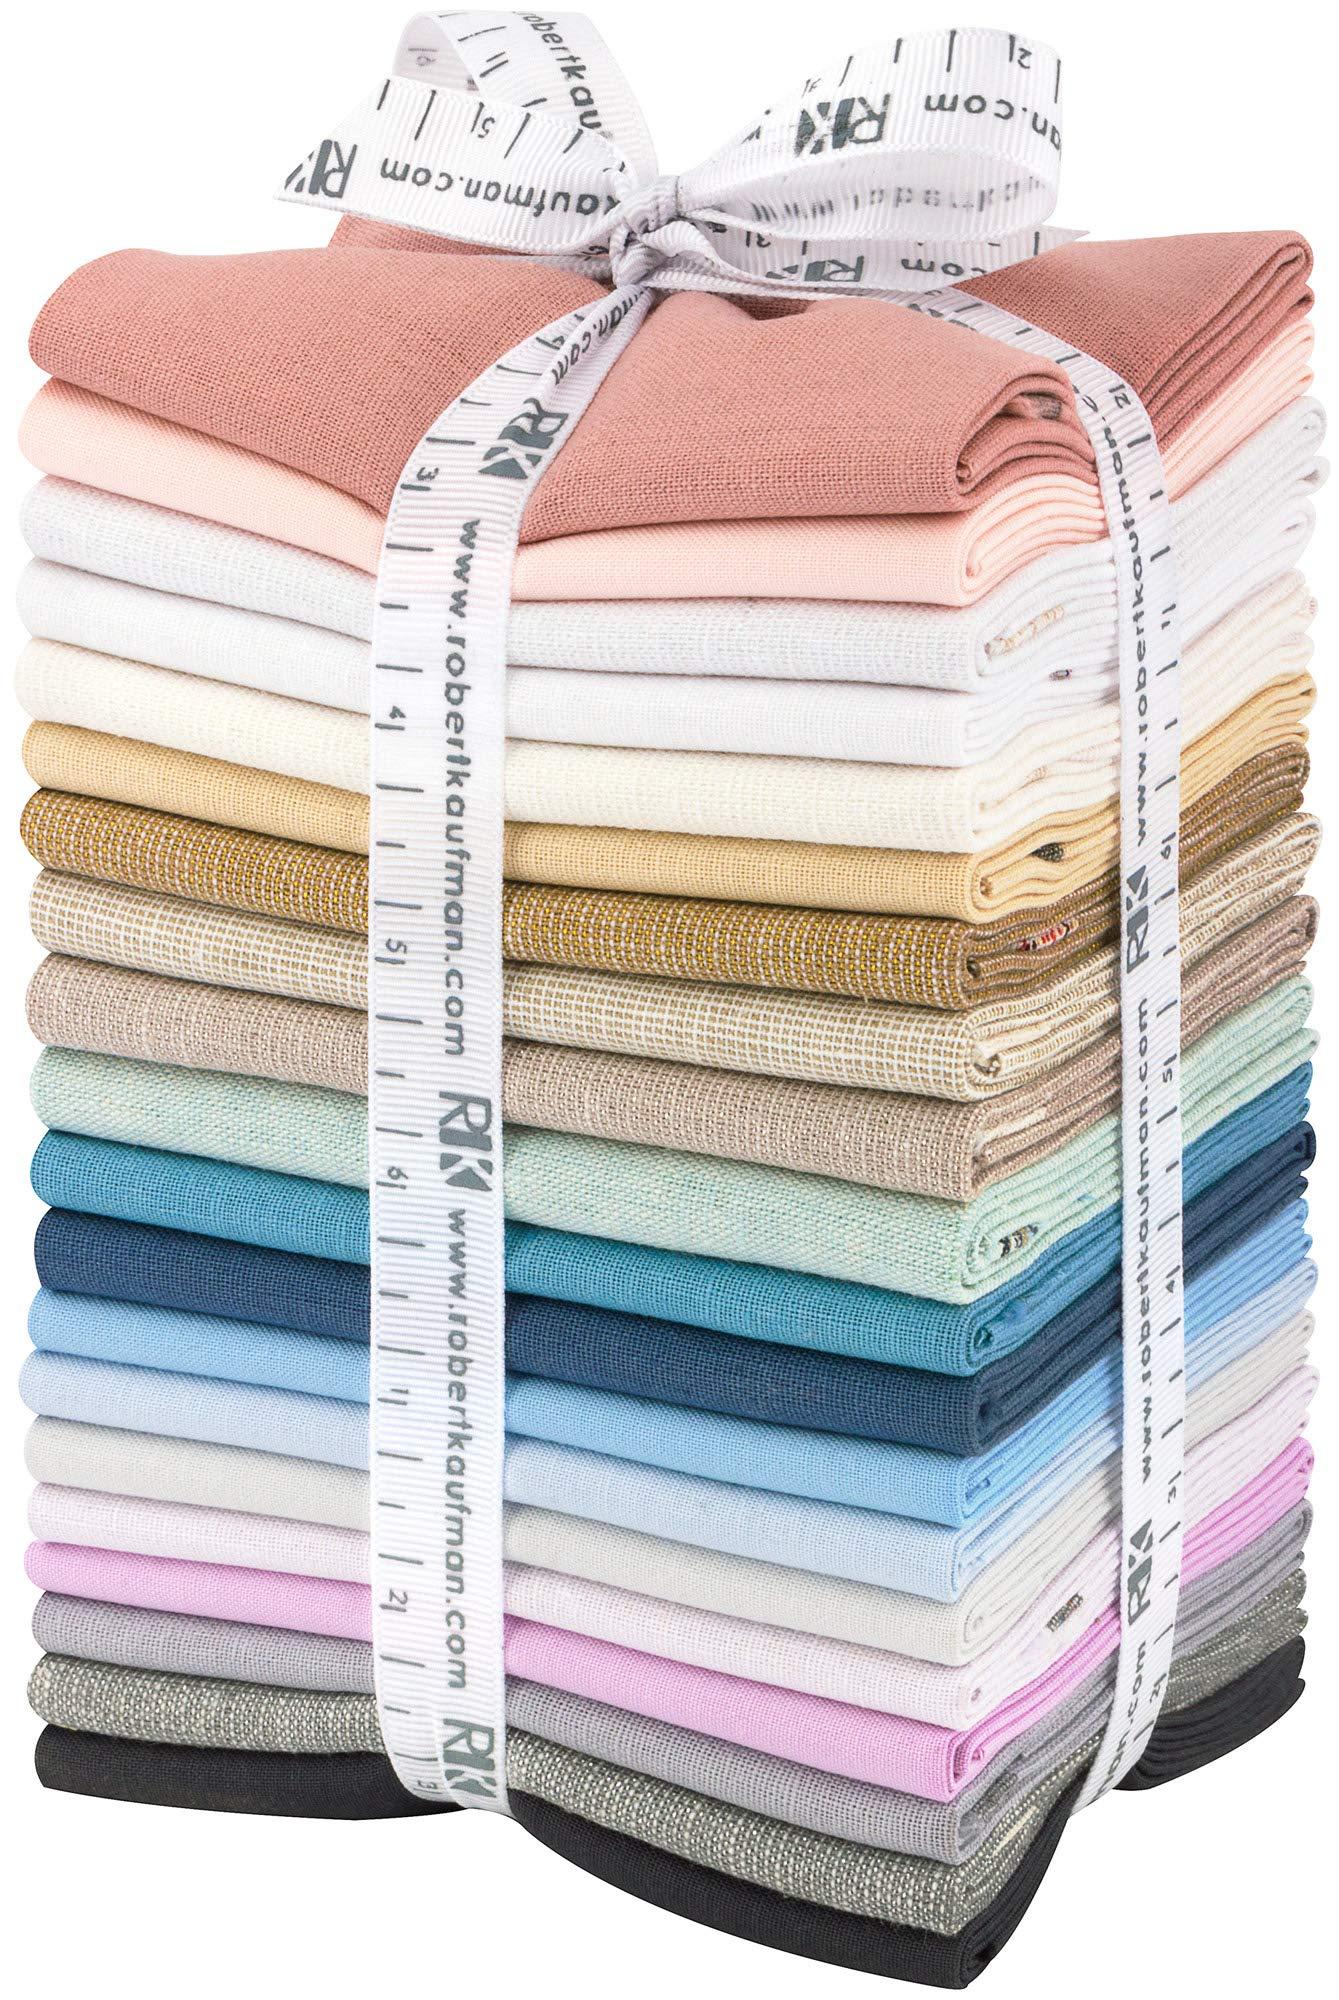 Winter Shimmer Coordinates 20 Fat Quarters by Jennifer Sampou for Robert Kaufman Fabrics FQ-1489-20 by Robert Kaufman Fabrics